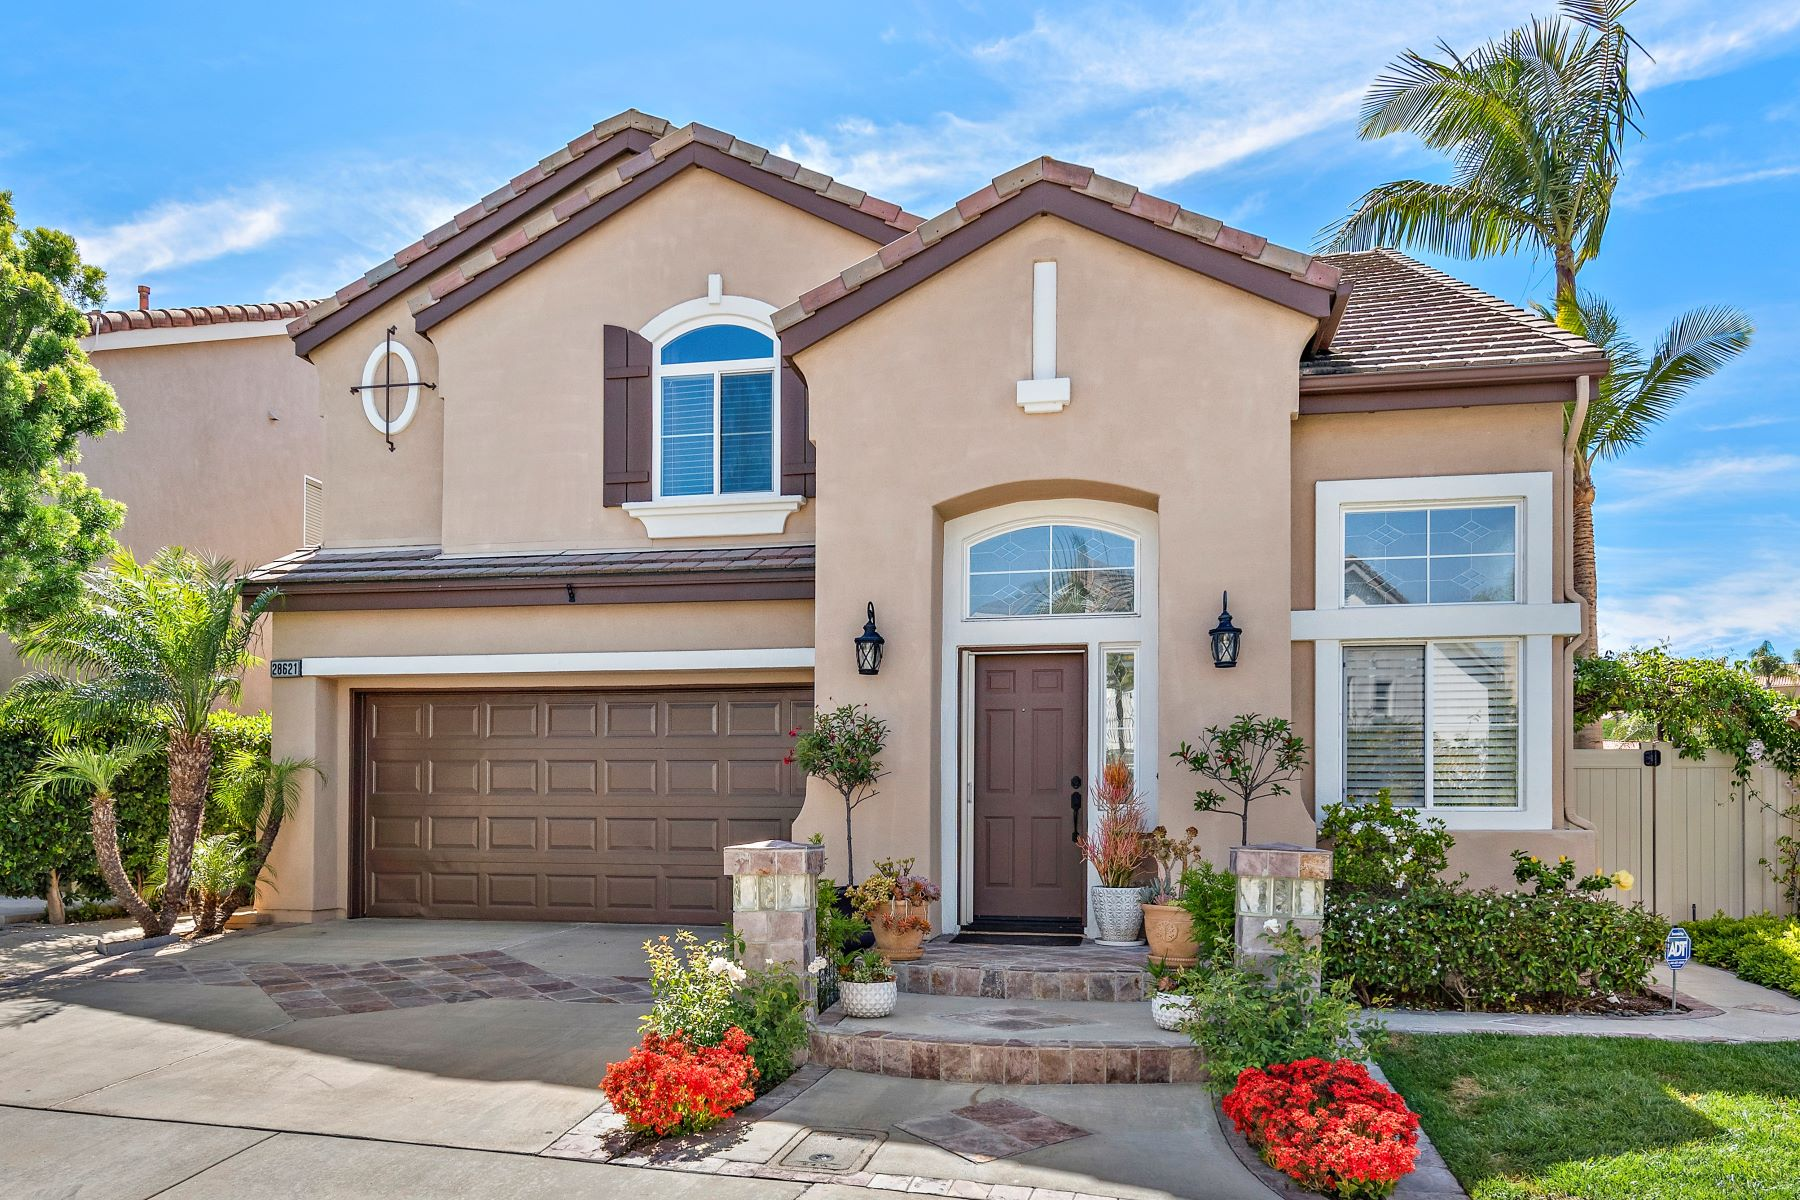 Single Family Homes for Sale at 28621 Via Reggio, Laguna Niguel, CA 28621 Via Reggio Laguna Niguel, California 92677 United States